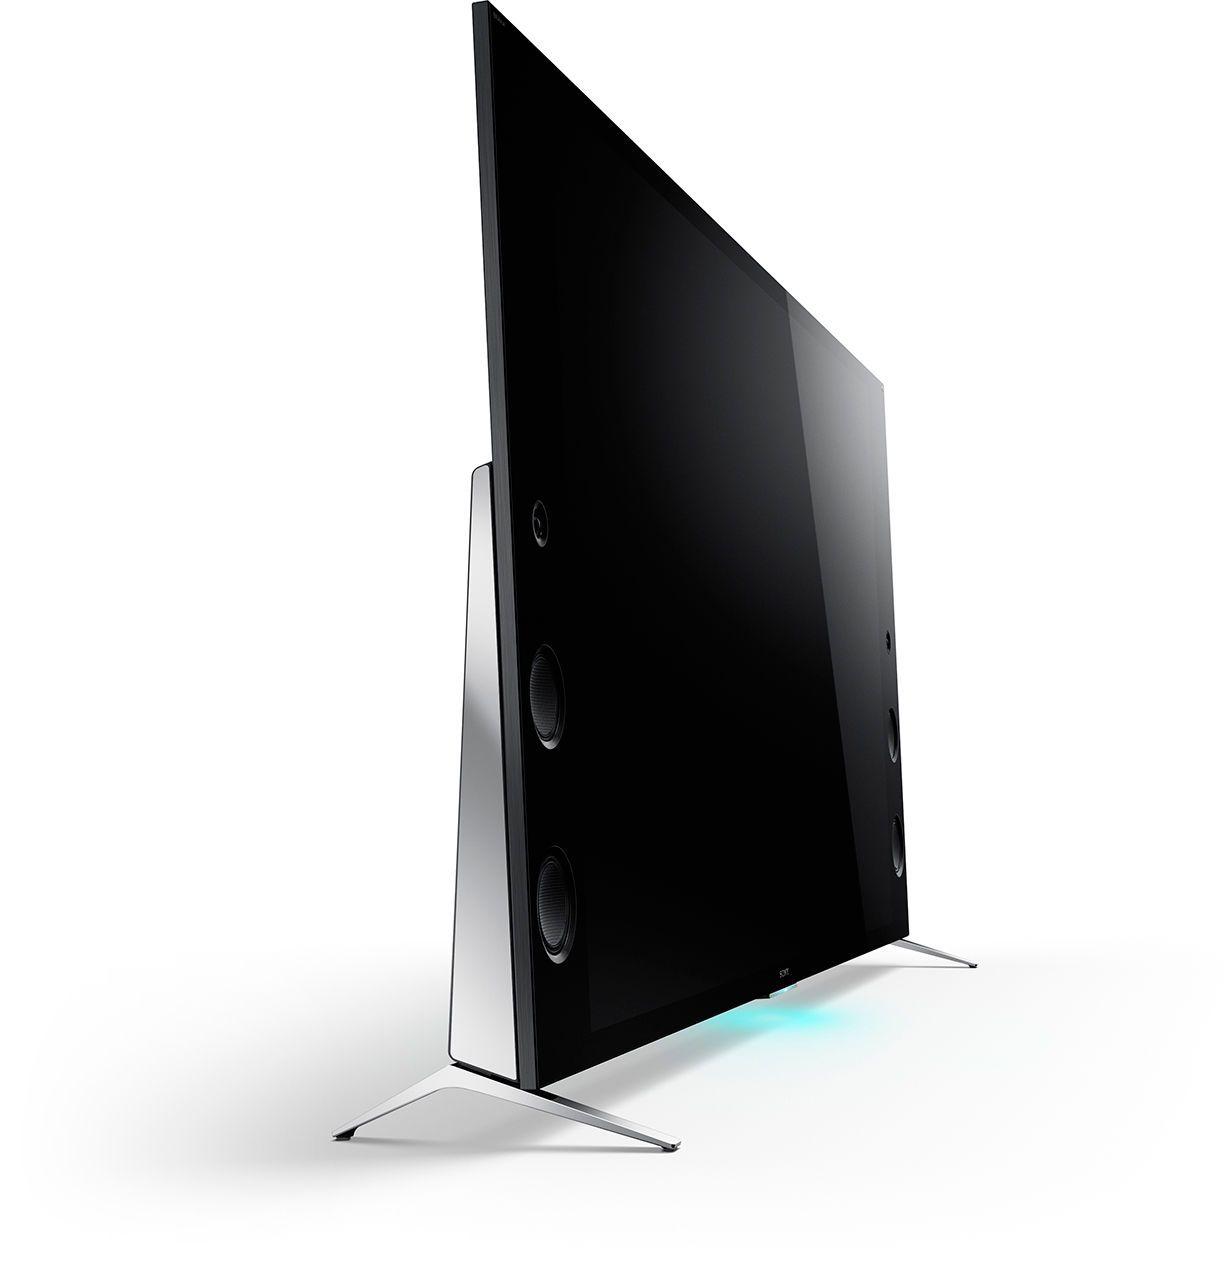 4k Tv Bravia X930c Sony デザイナー プロダクトデザイン プロダクト